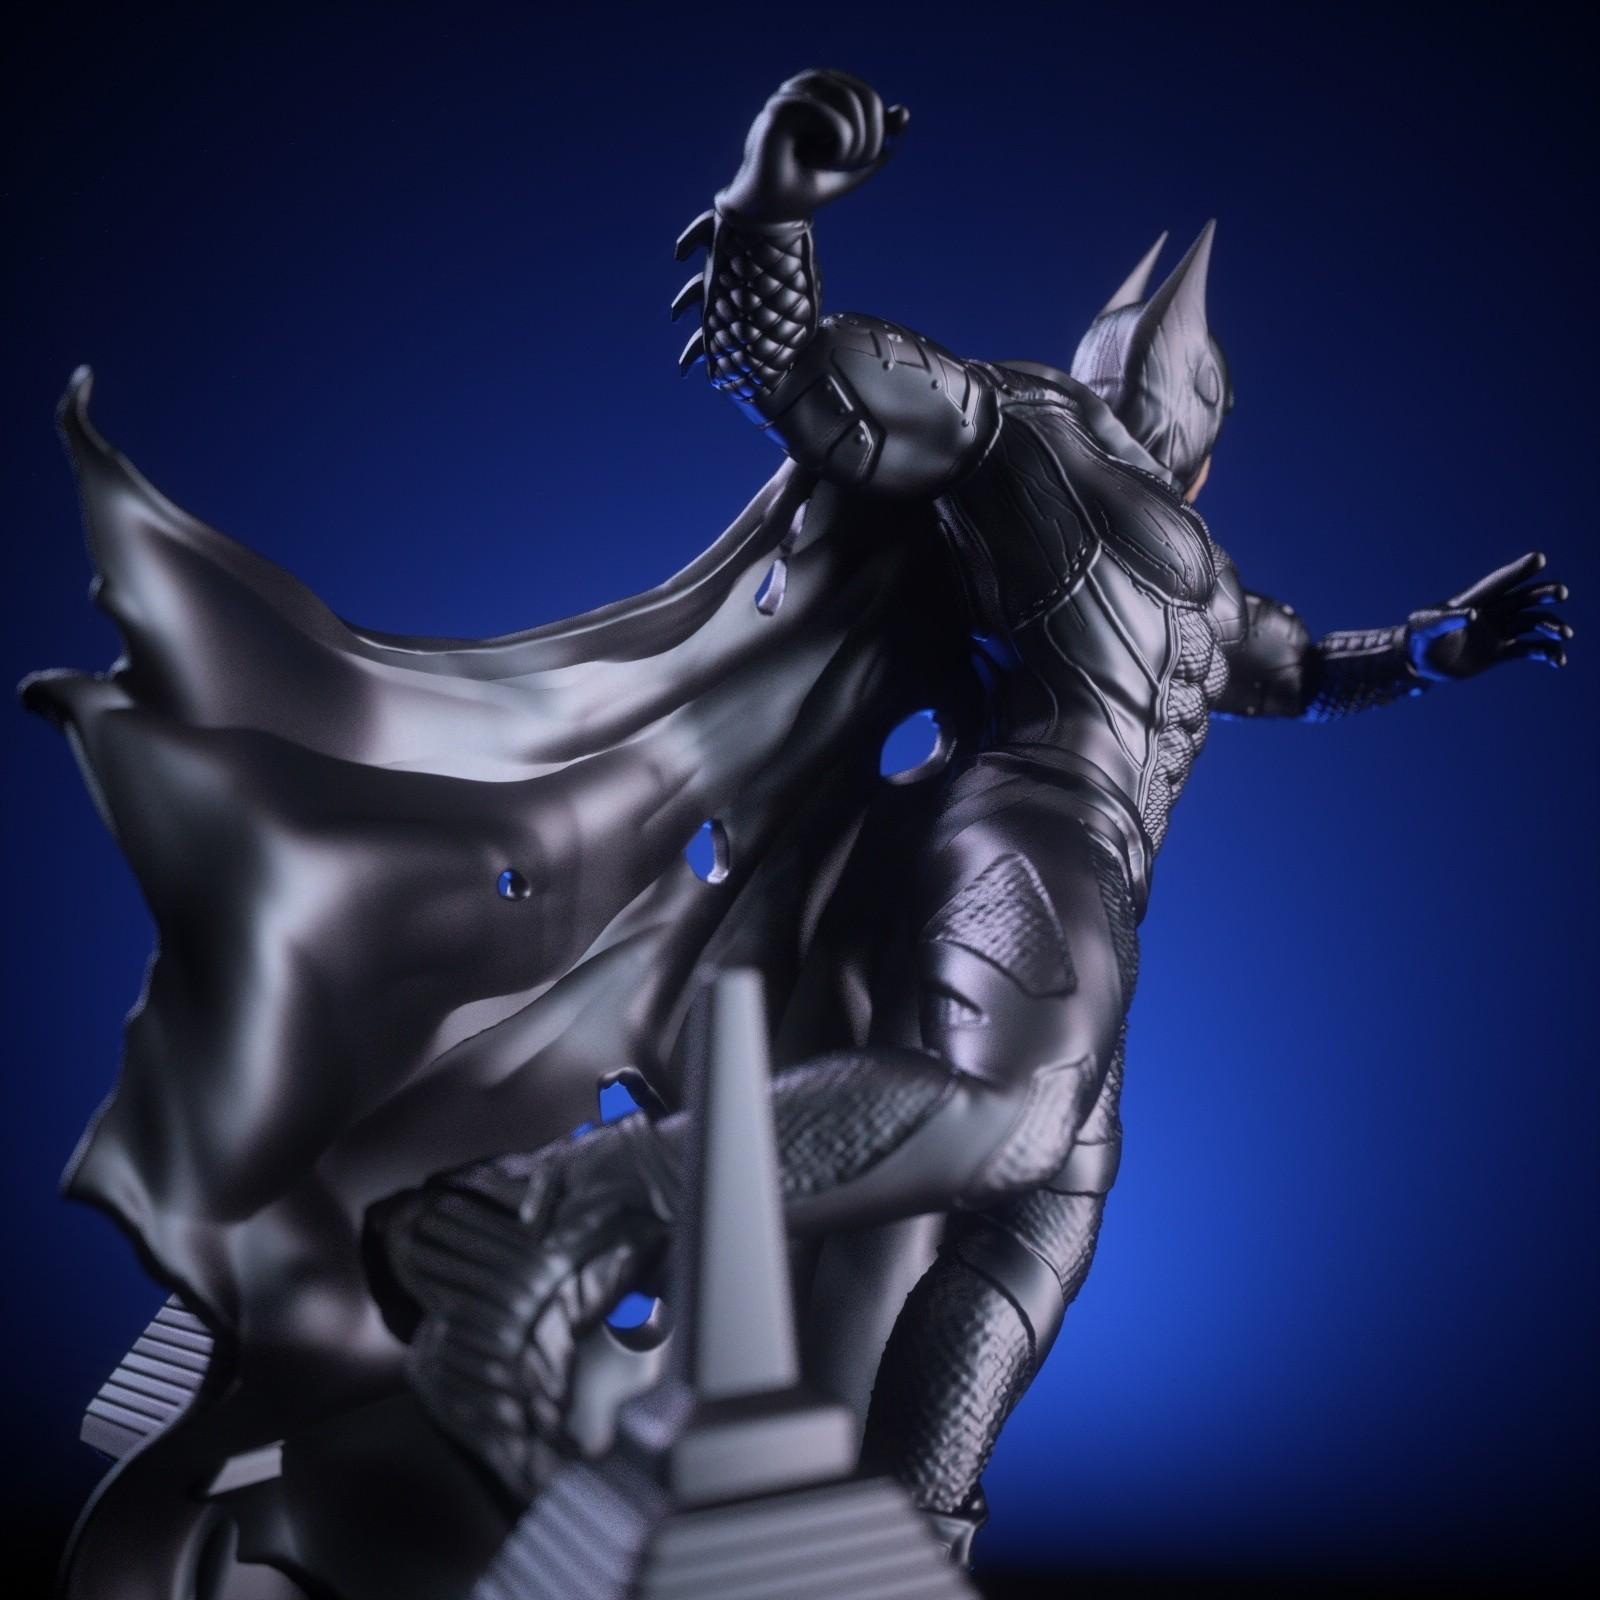 5.jpg Download OBJ file BATMAN Battle Pose • 3D print template, tolgaaxu